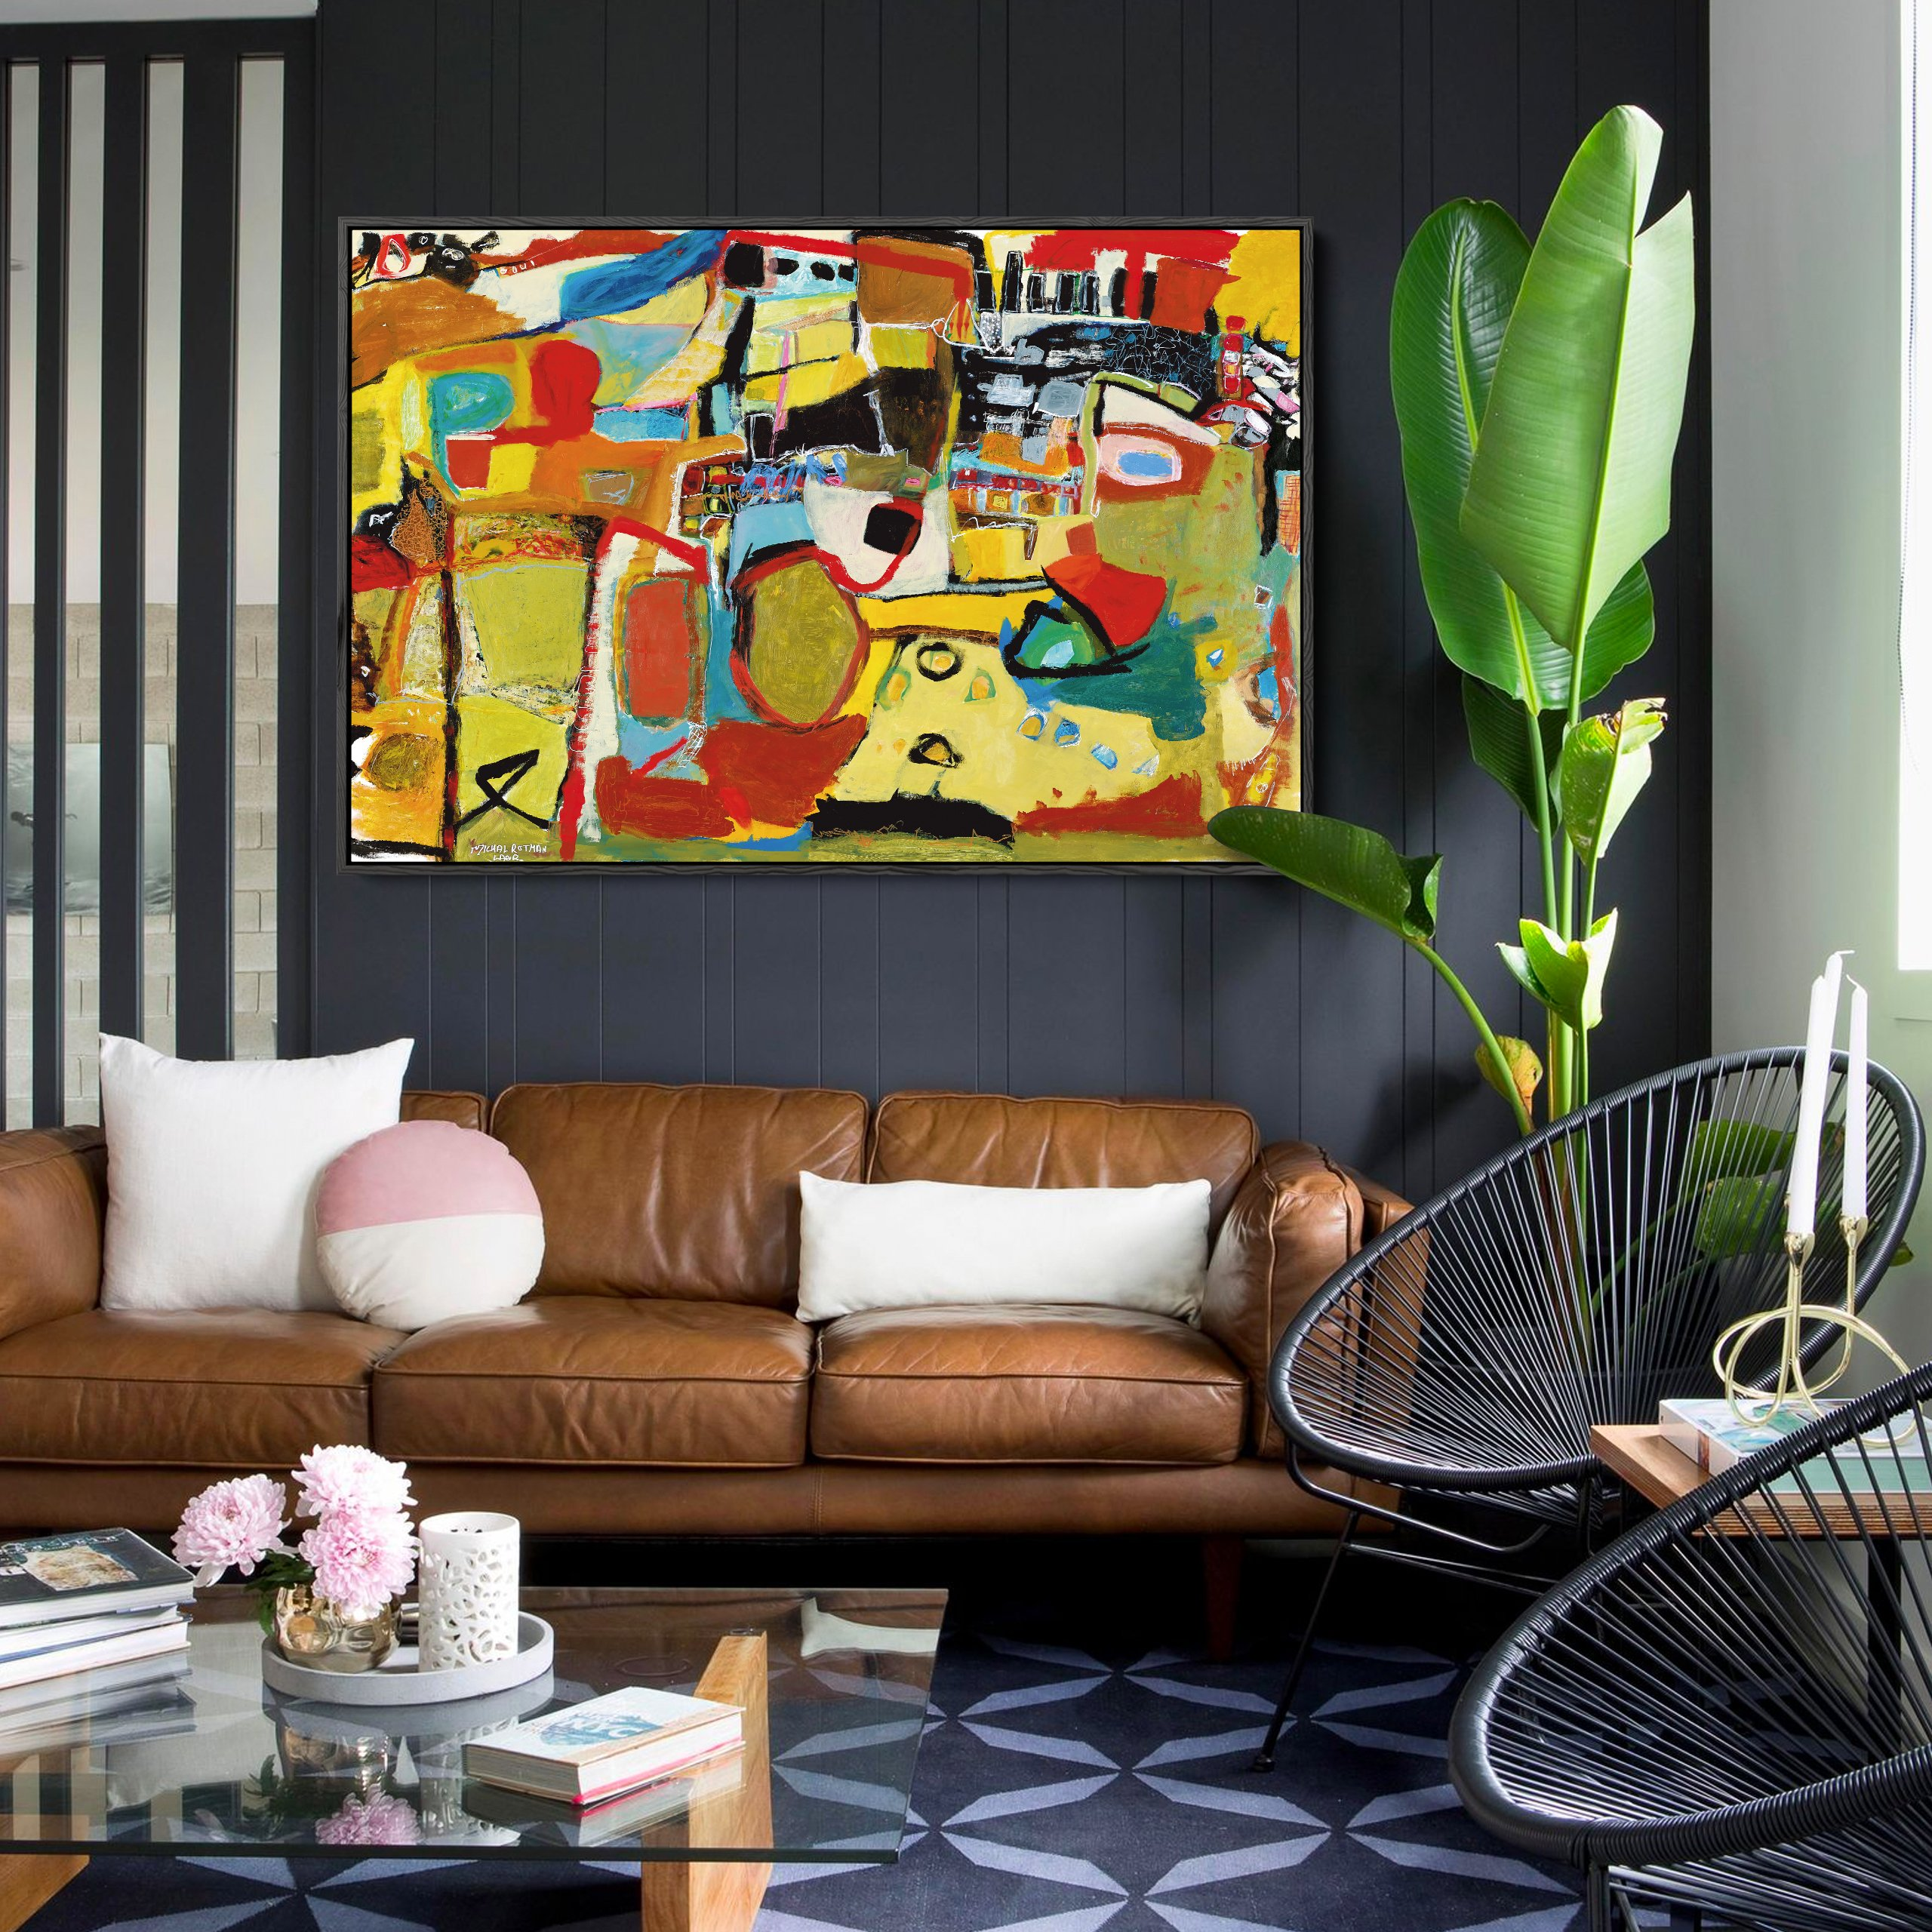 michal-rotman-laor-b-6-modern-print-on-canvas